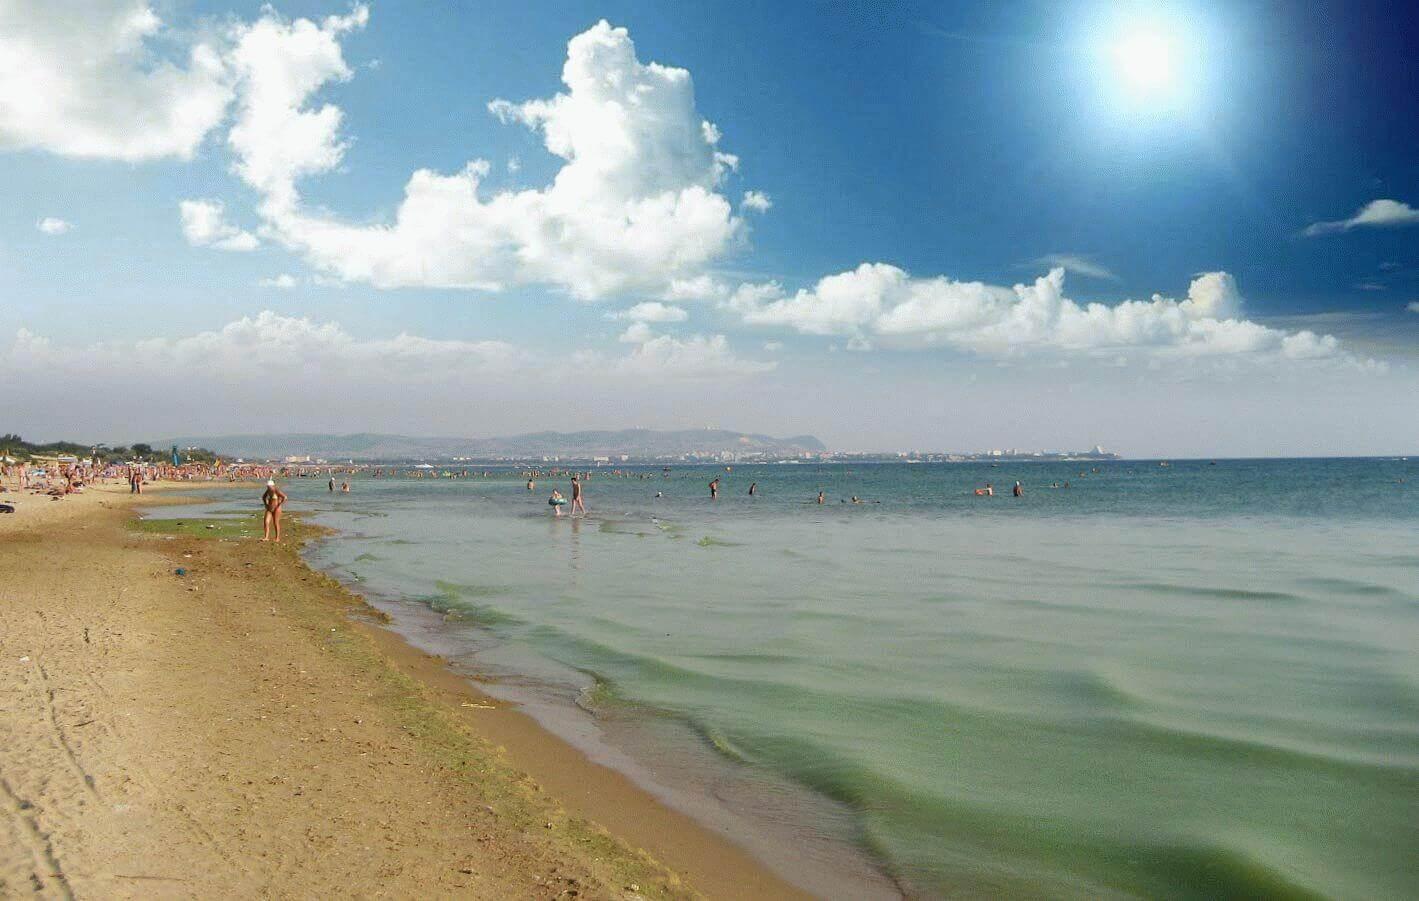 В Анапе вновь запретили плавать в море на матрасах и катамаранах